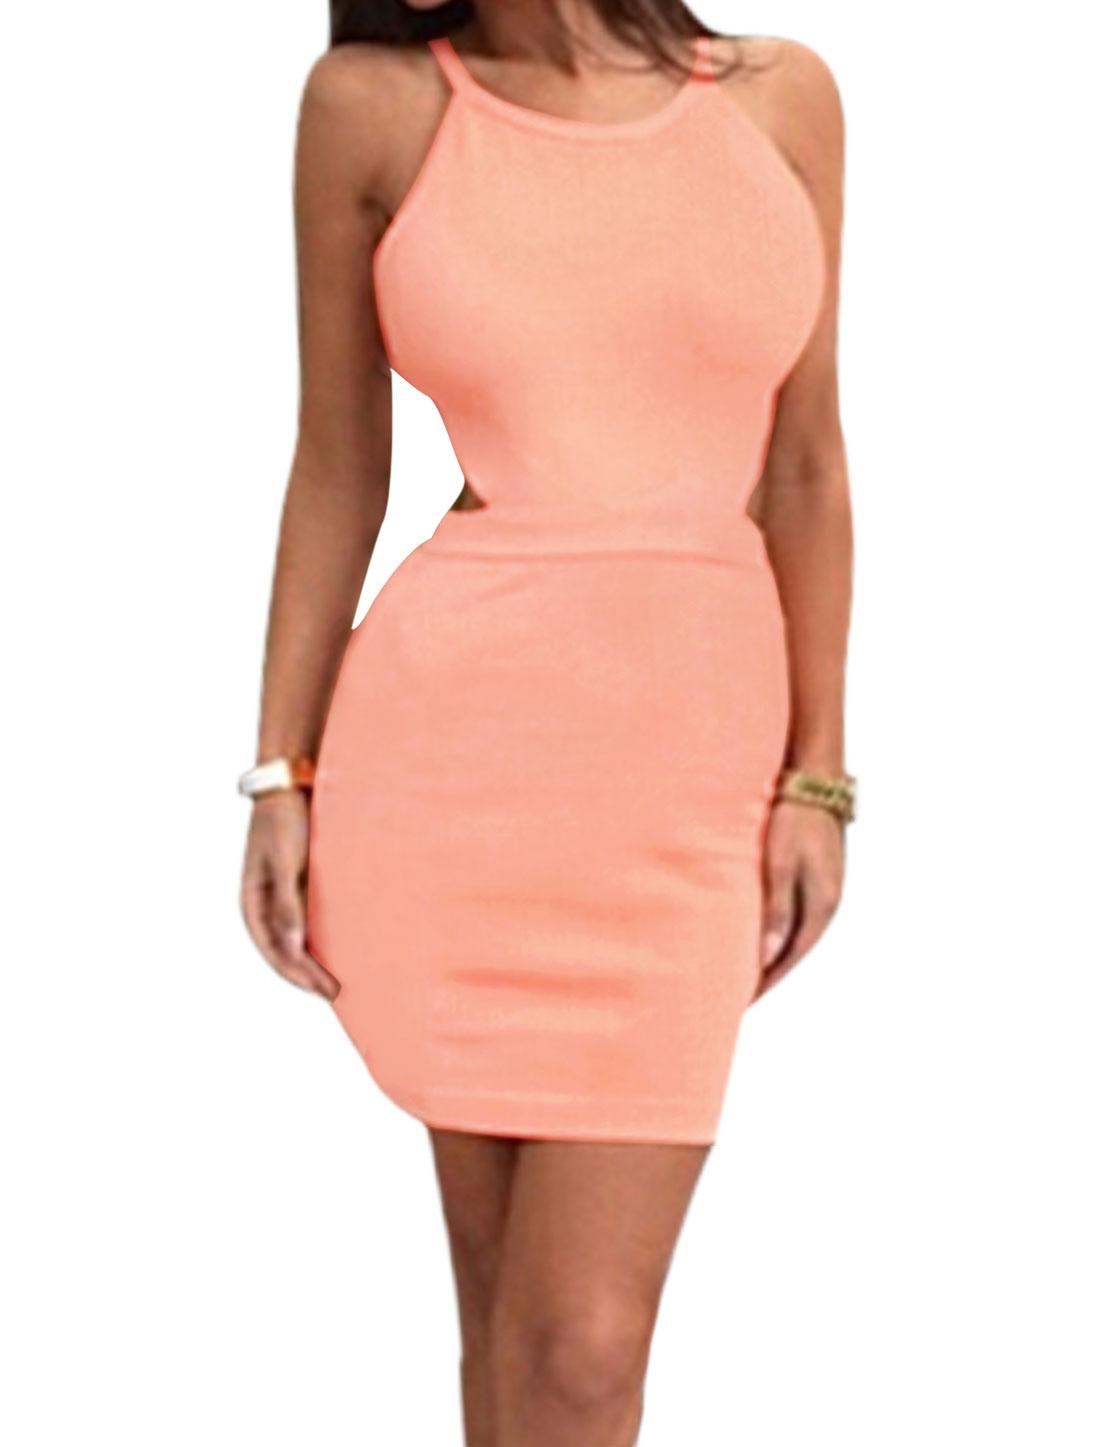 Woman U Neck Cut Out Back Spaghetti Straps Unlined Bodycon Dress XL